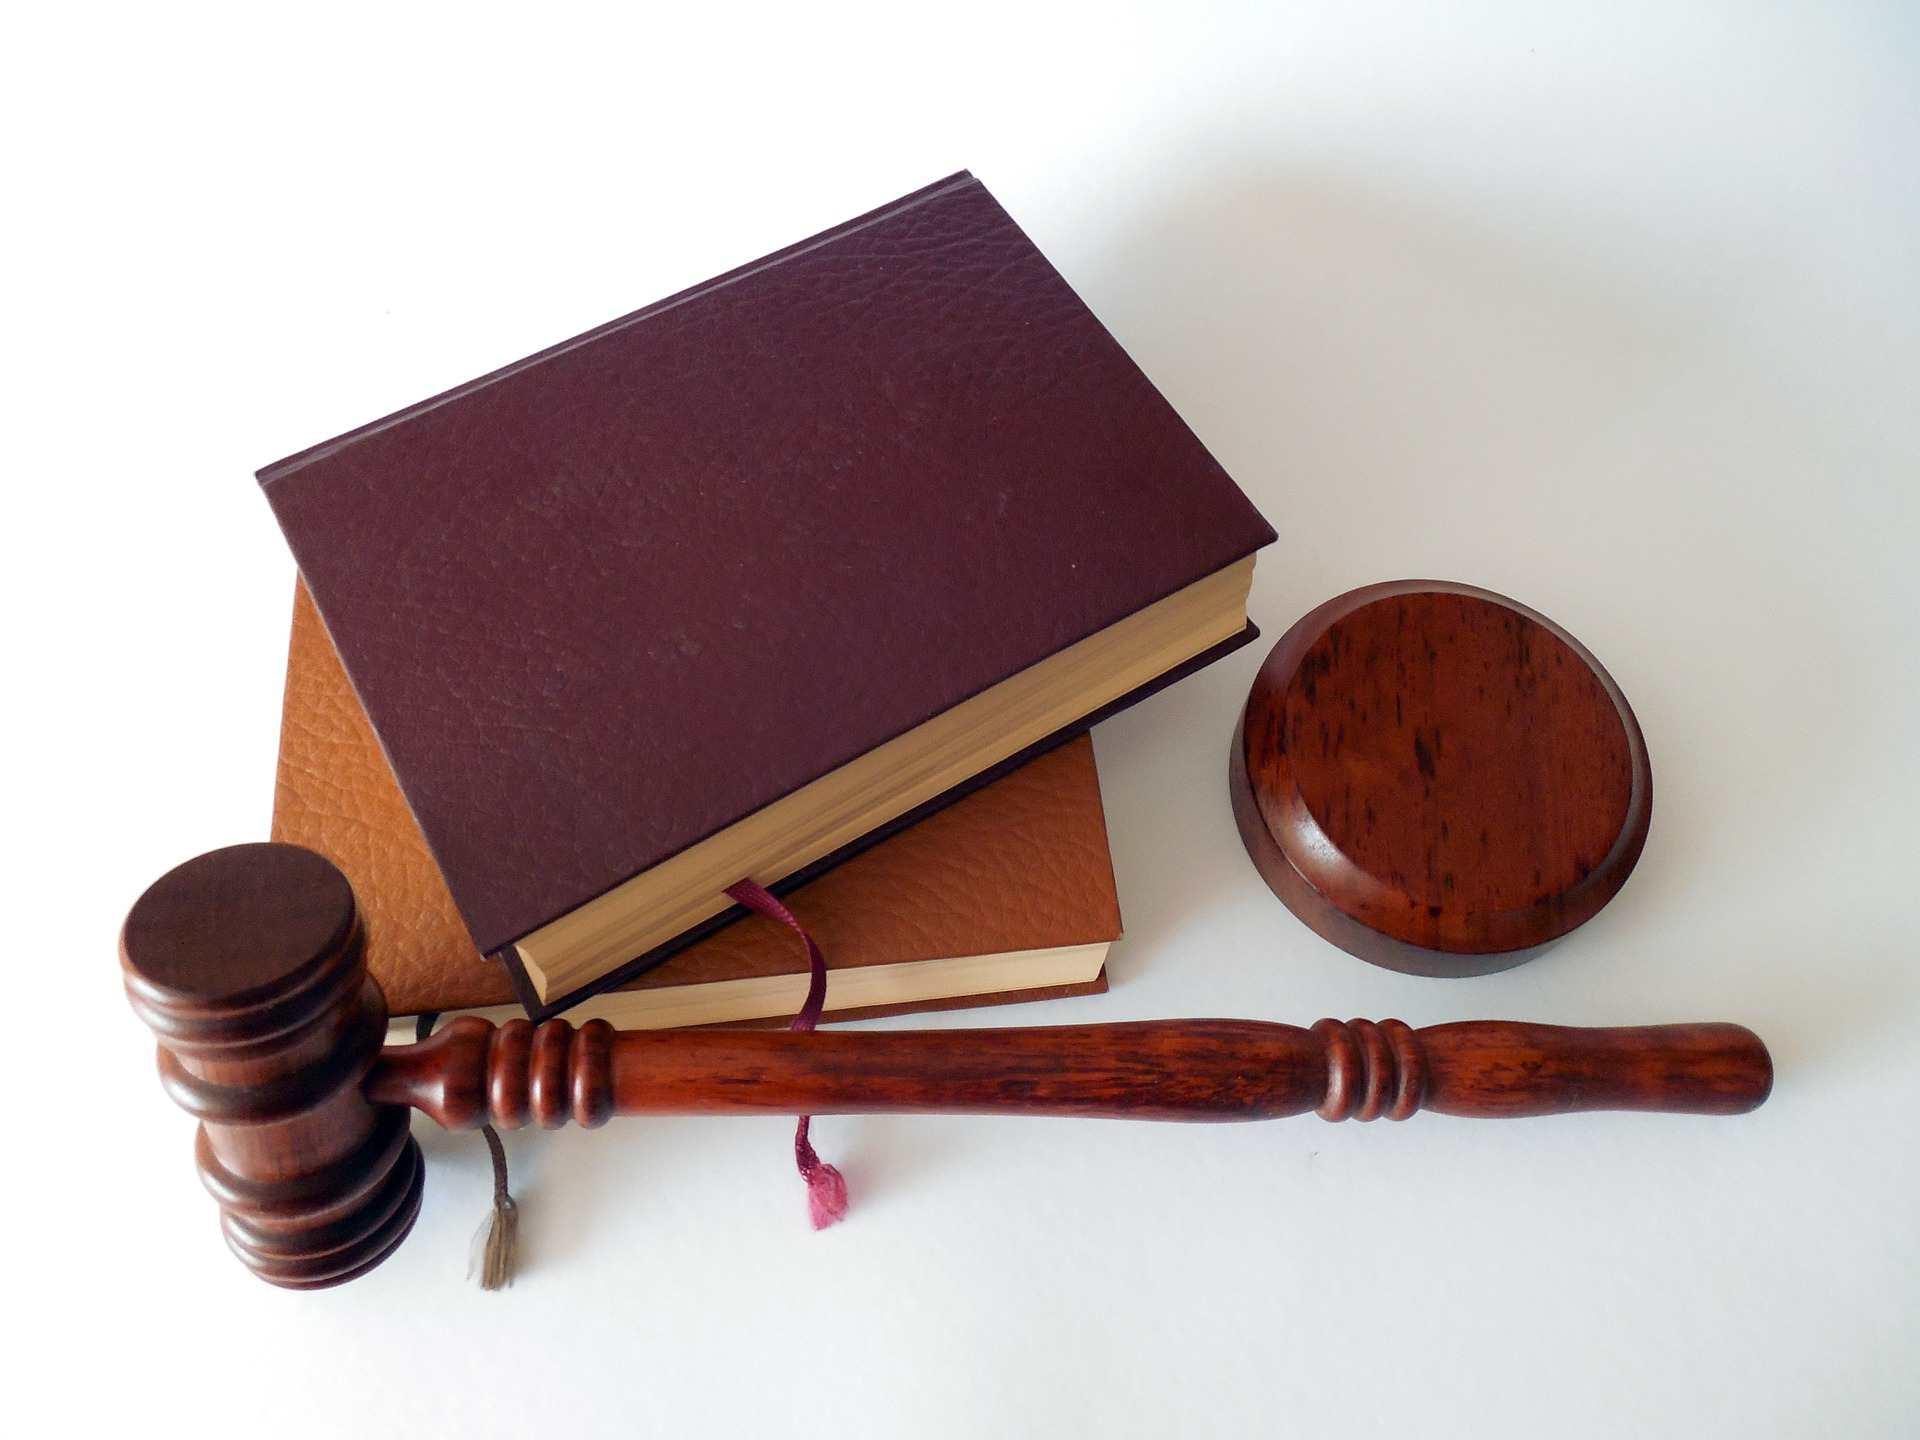 un avocat avec wazaa.be